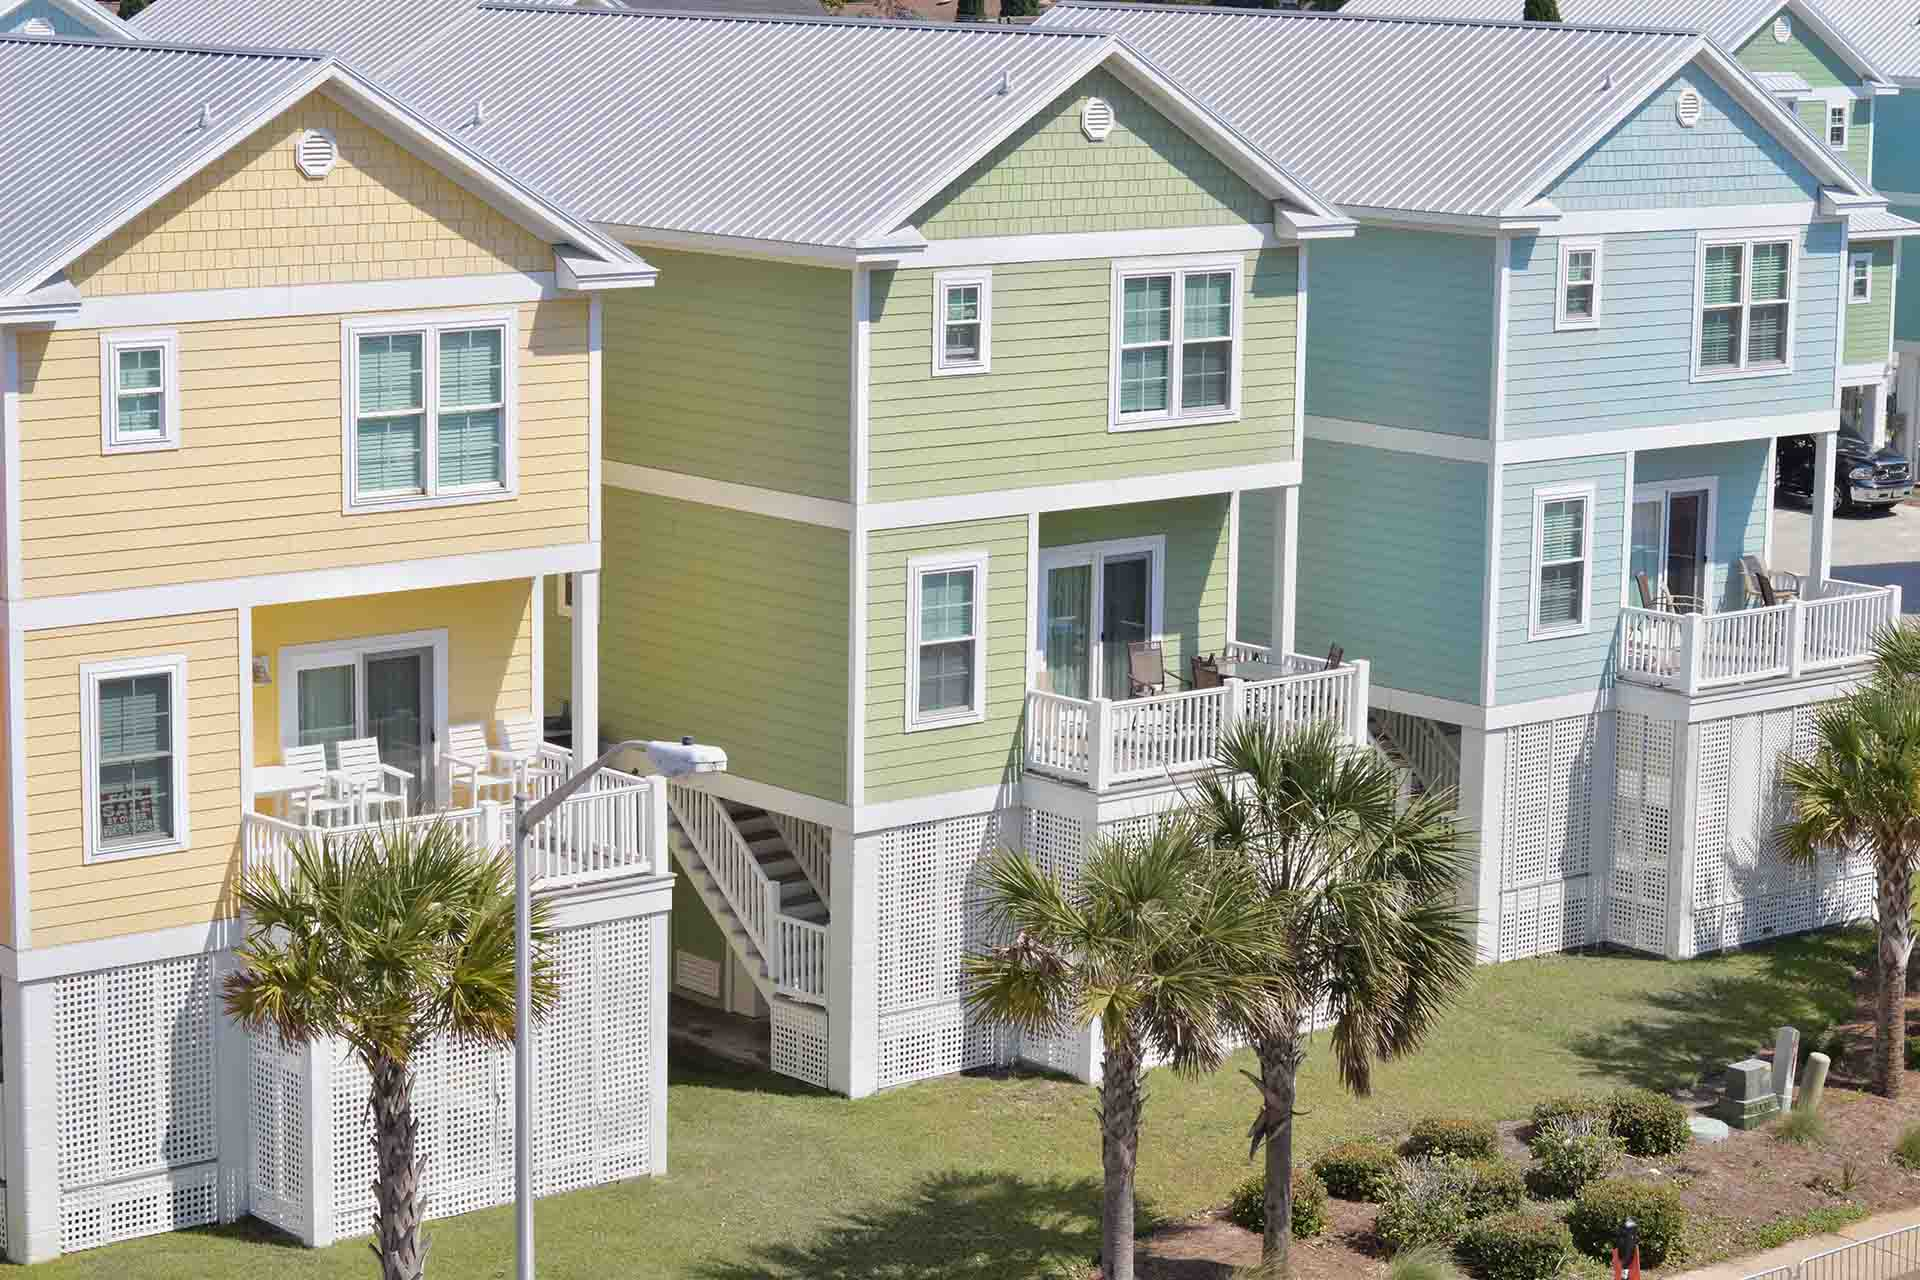 5 popular renovation ideas for a condo